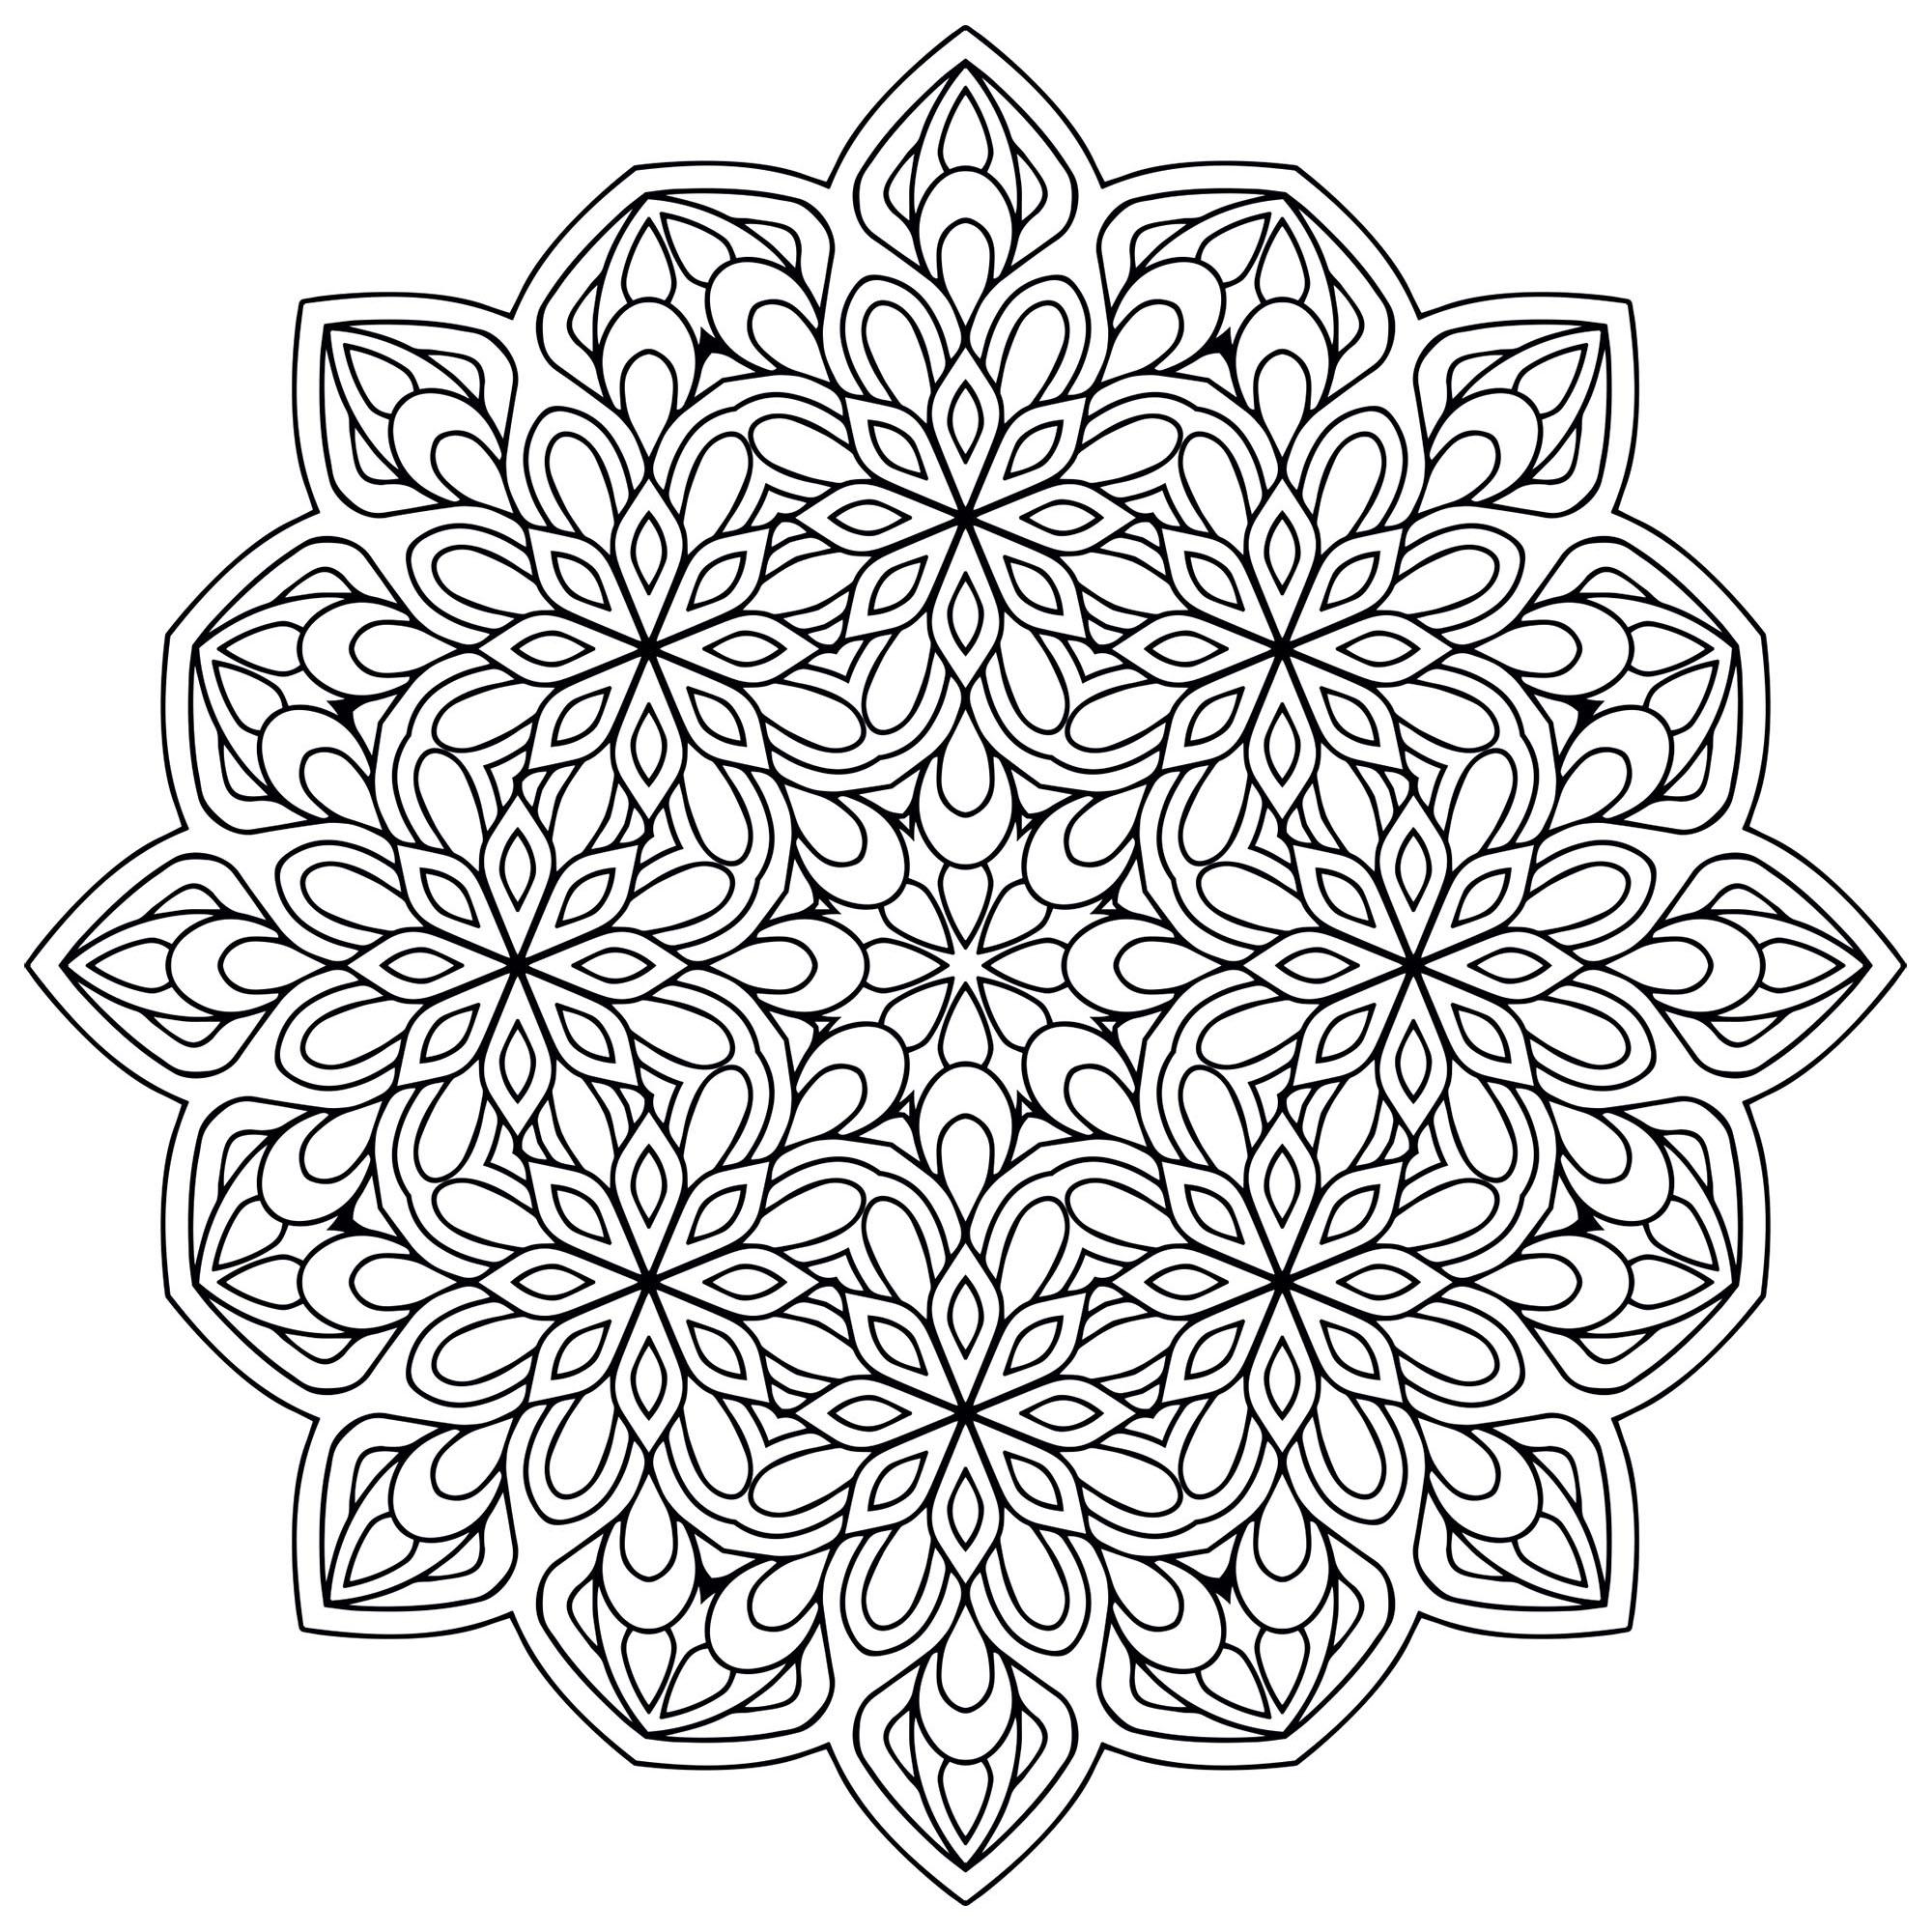 Colorear para Adultos : Mandalas - 2